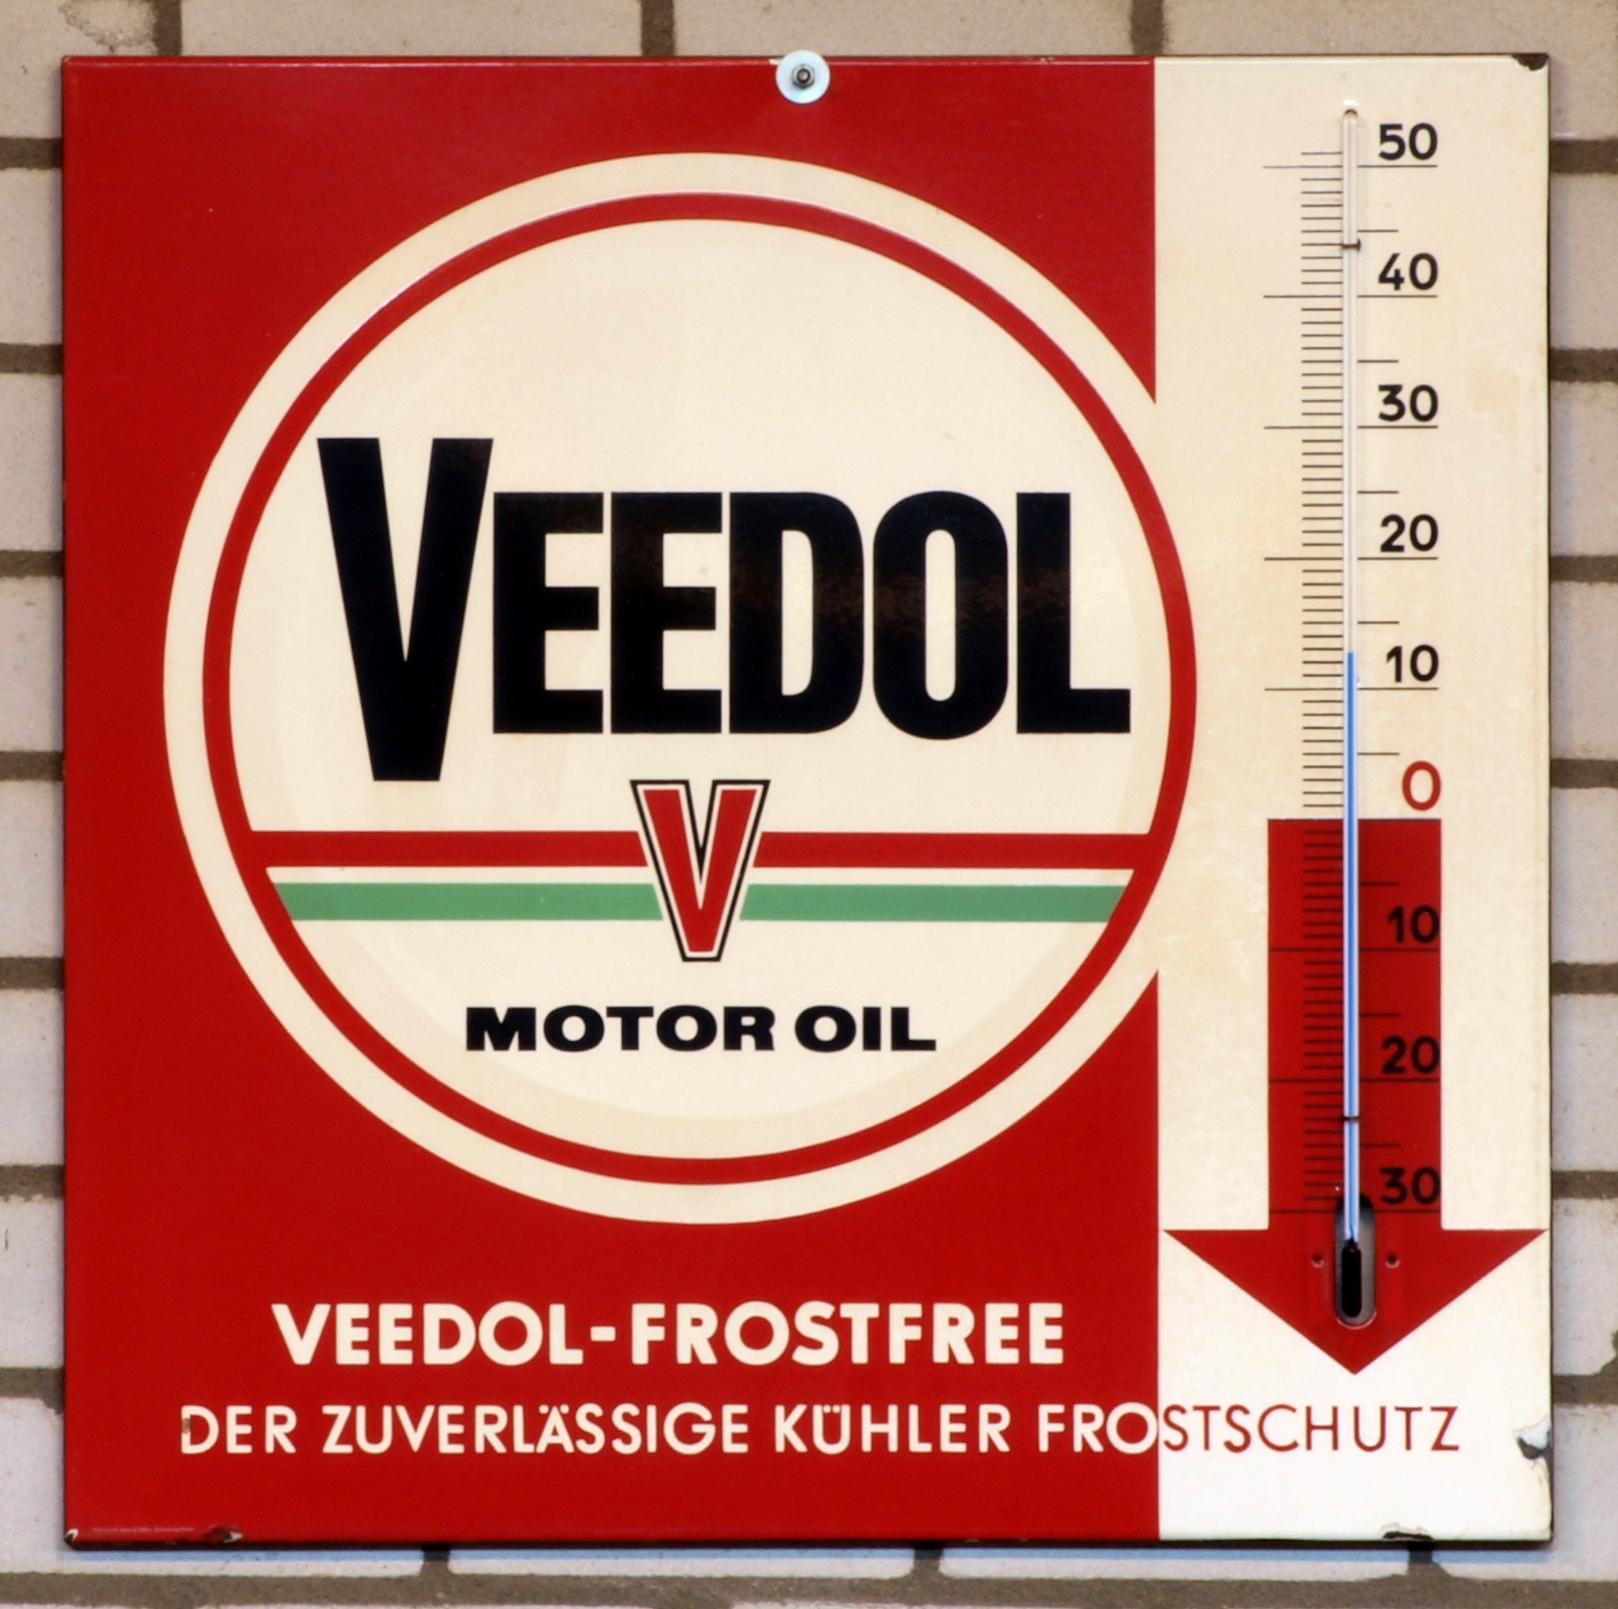 file veedol enamel advert sign at the den hartog ford museum pic 038 jpg wikimedia commons. Black Bedroom Furniture Sets. Home Design Ideas